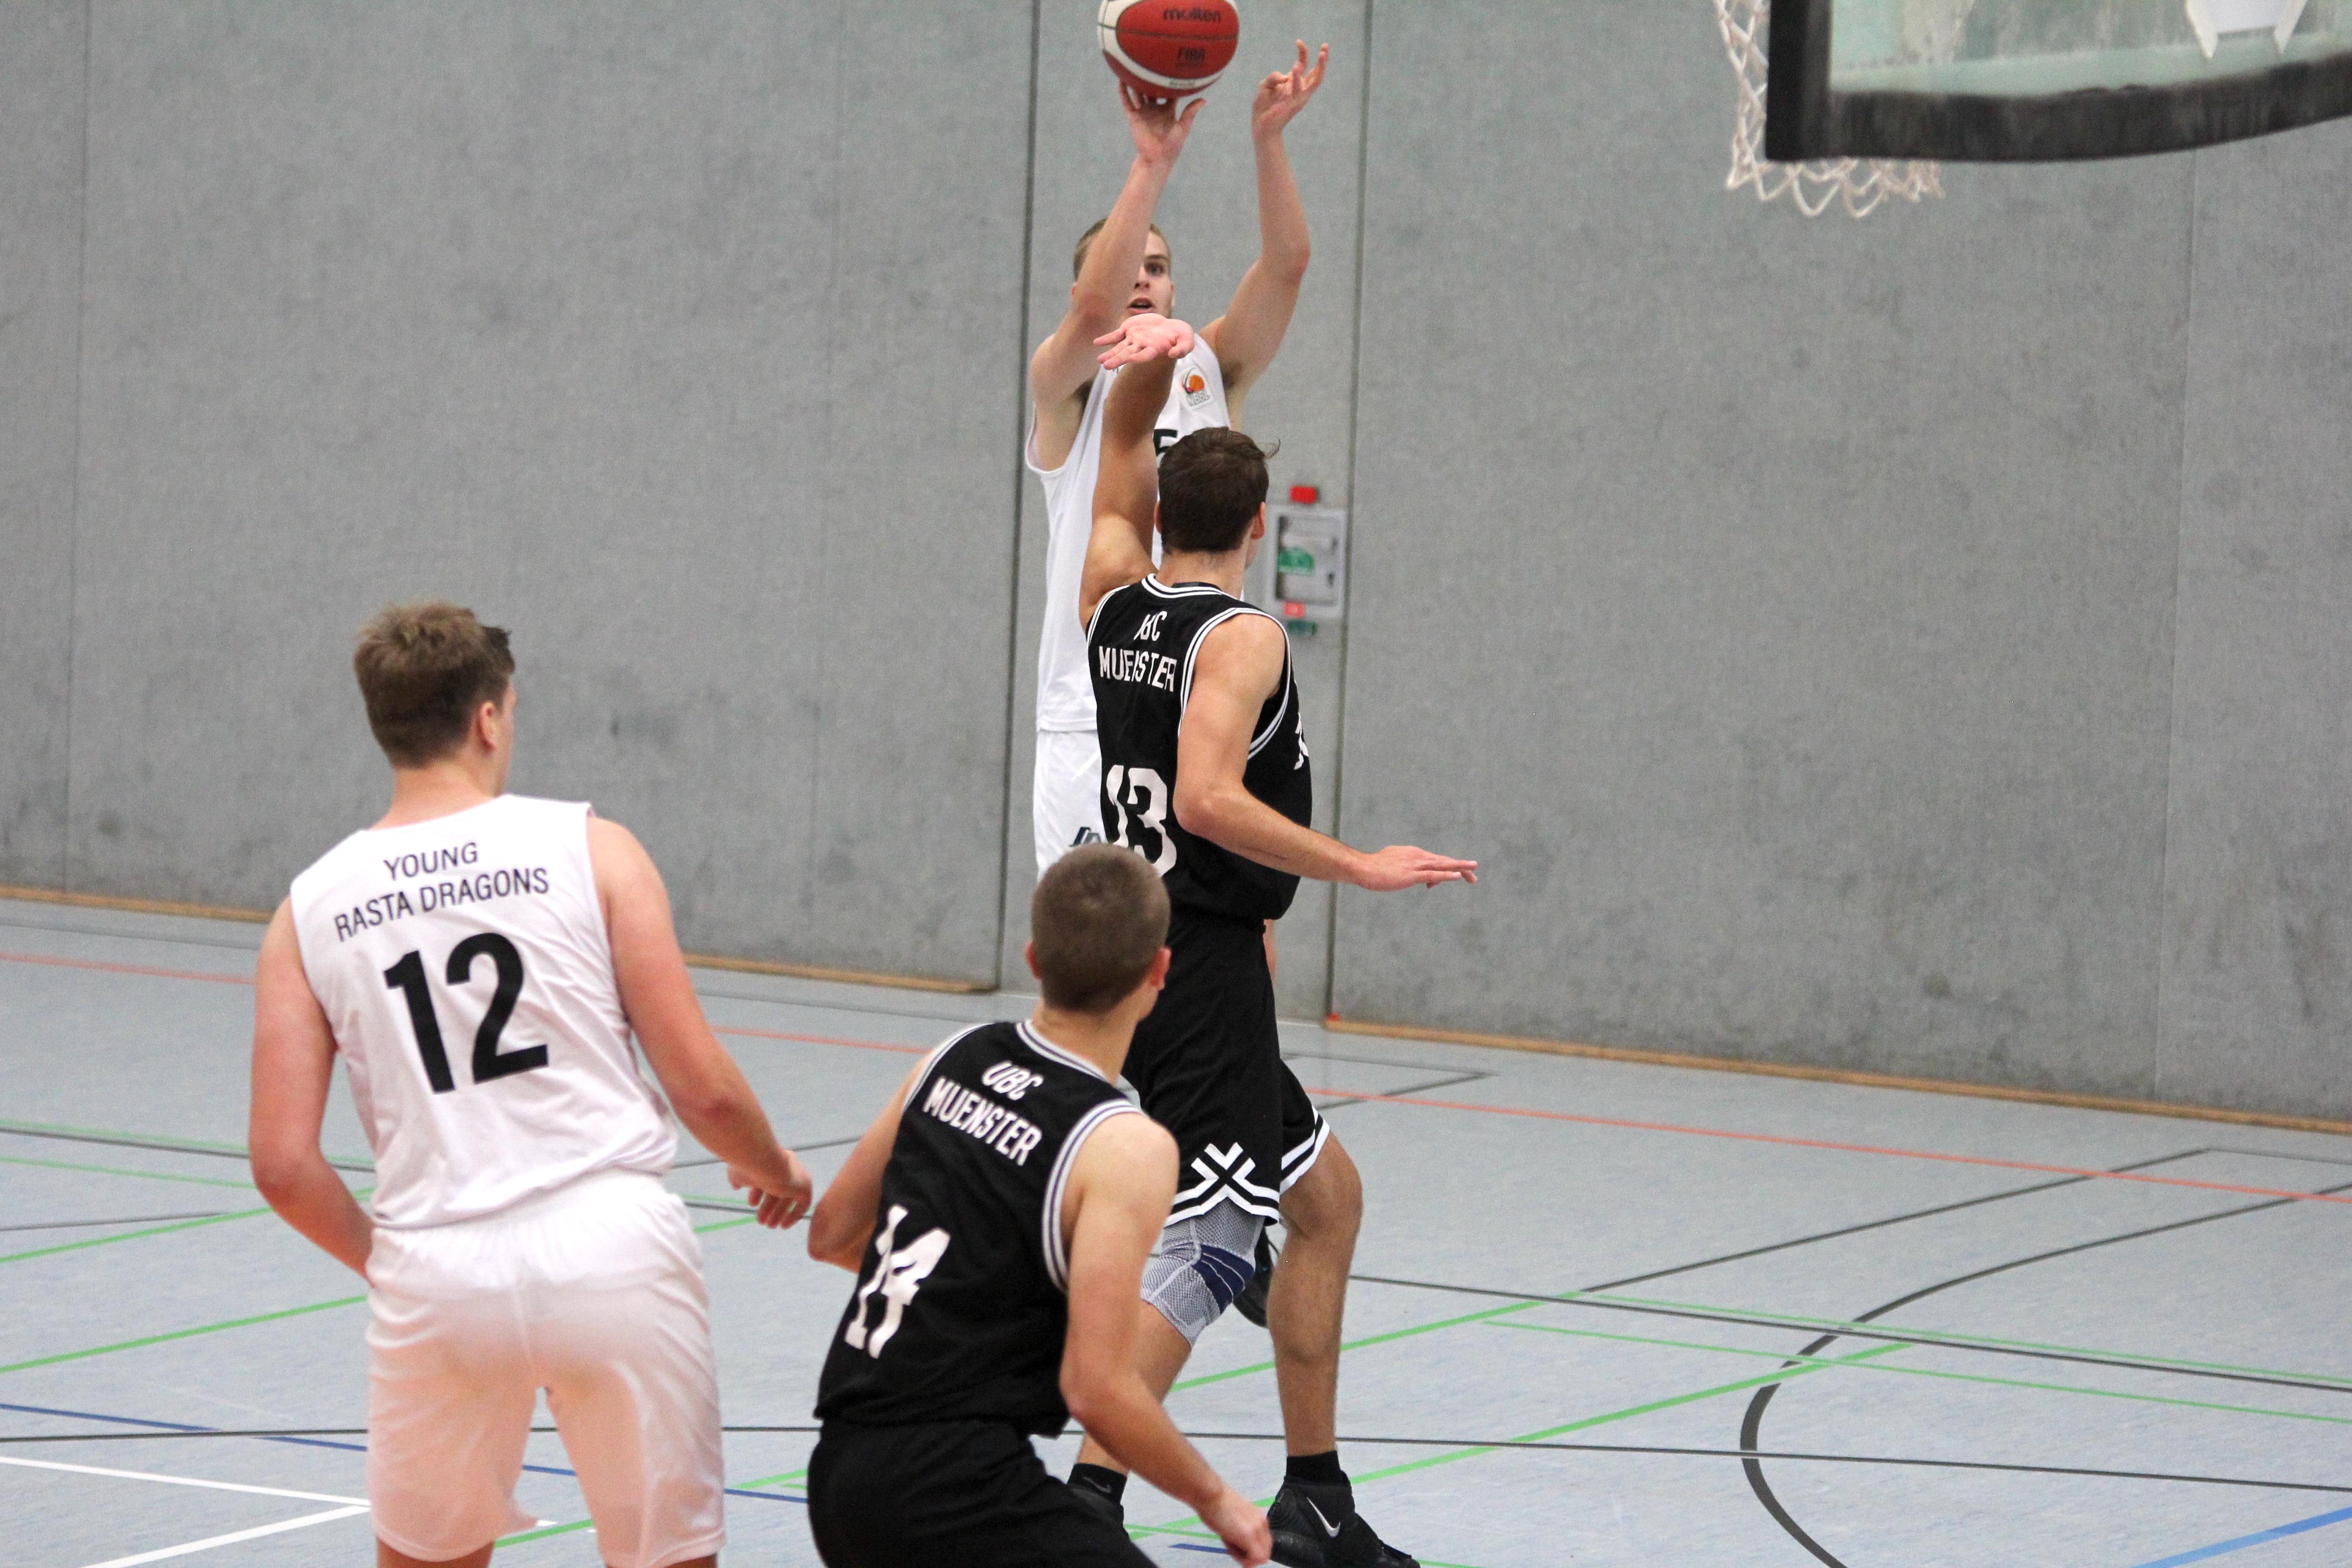 NBBL_20-21_YOUNG-RASTA-DRAGONS_Münster_Spieltag1_Torge-Buthmann_12